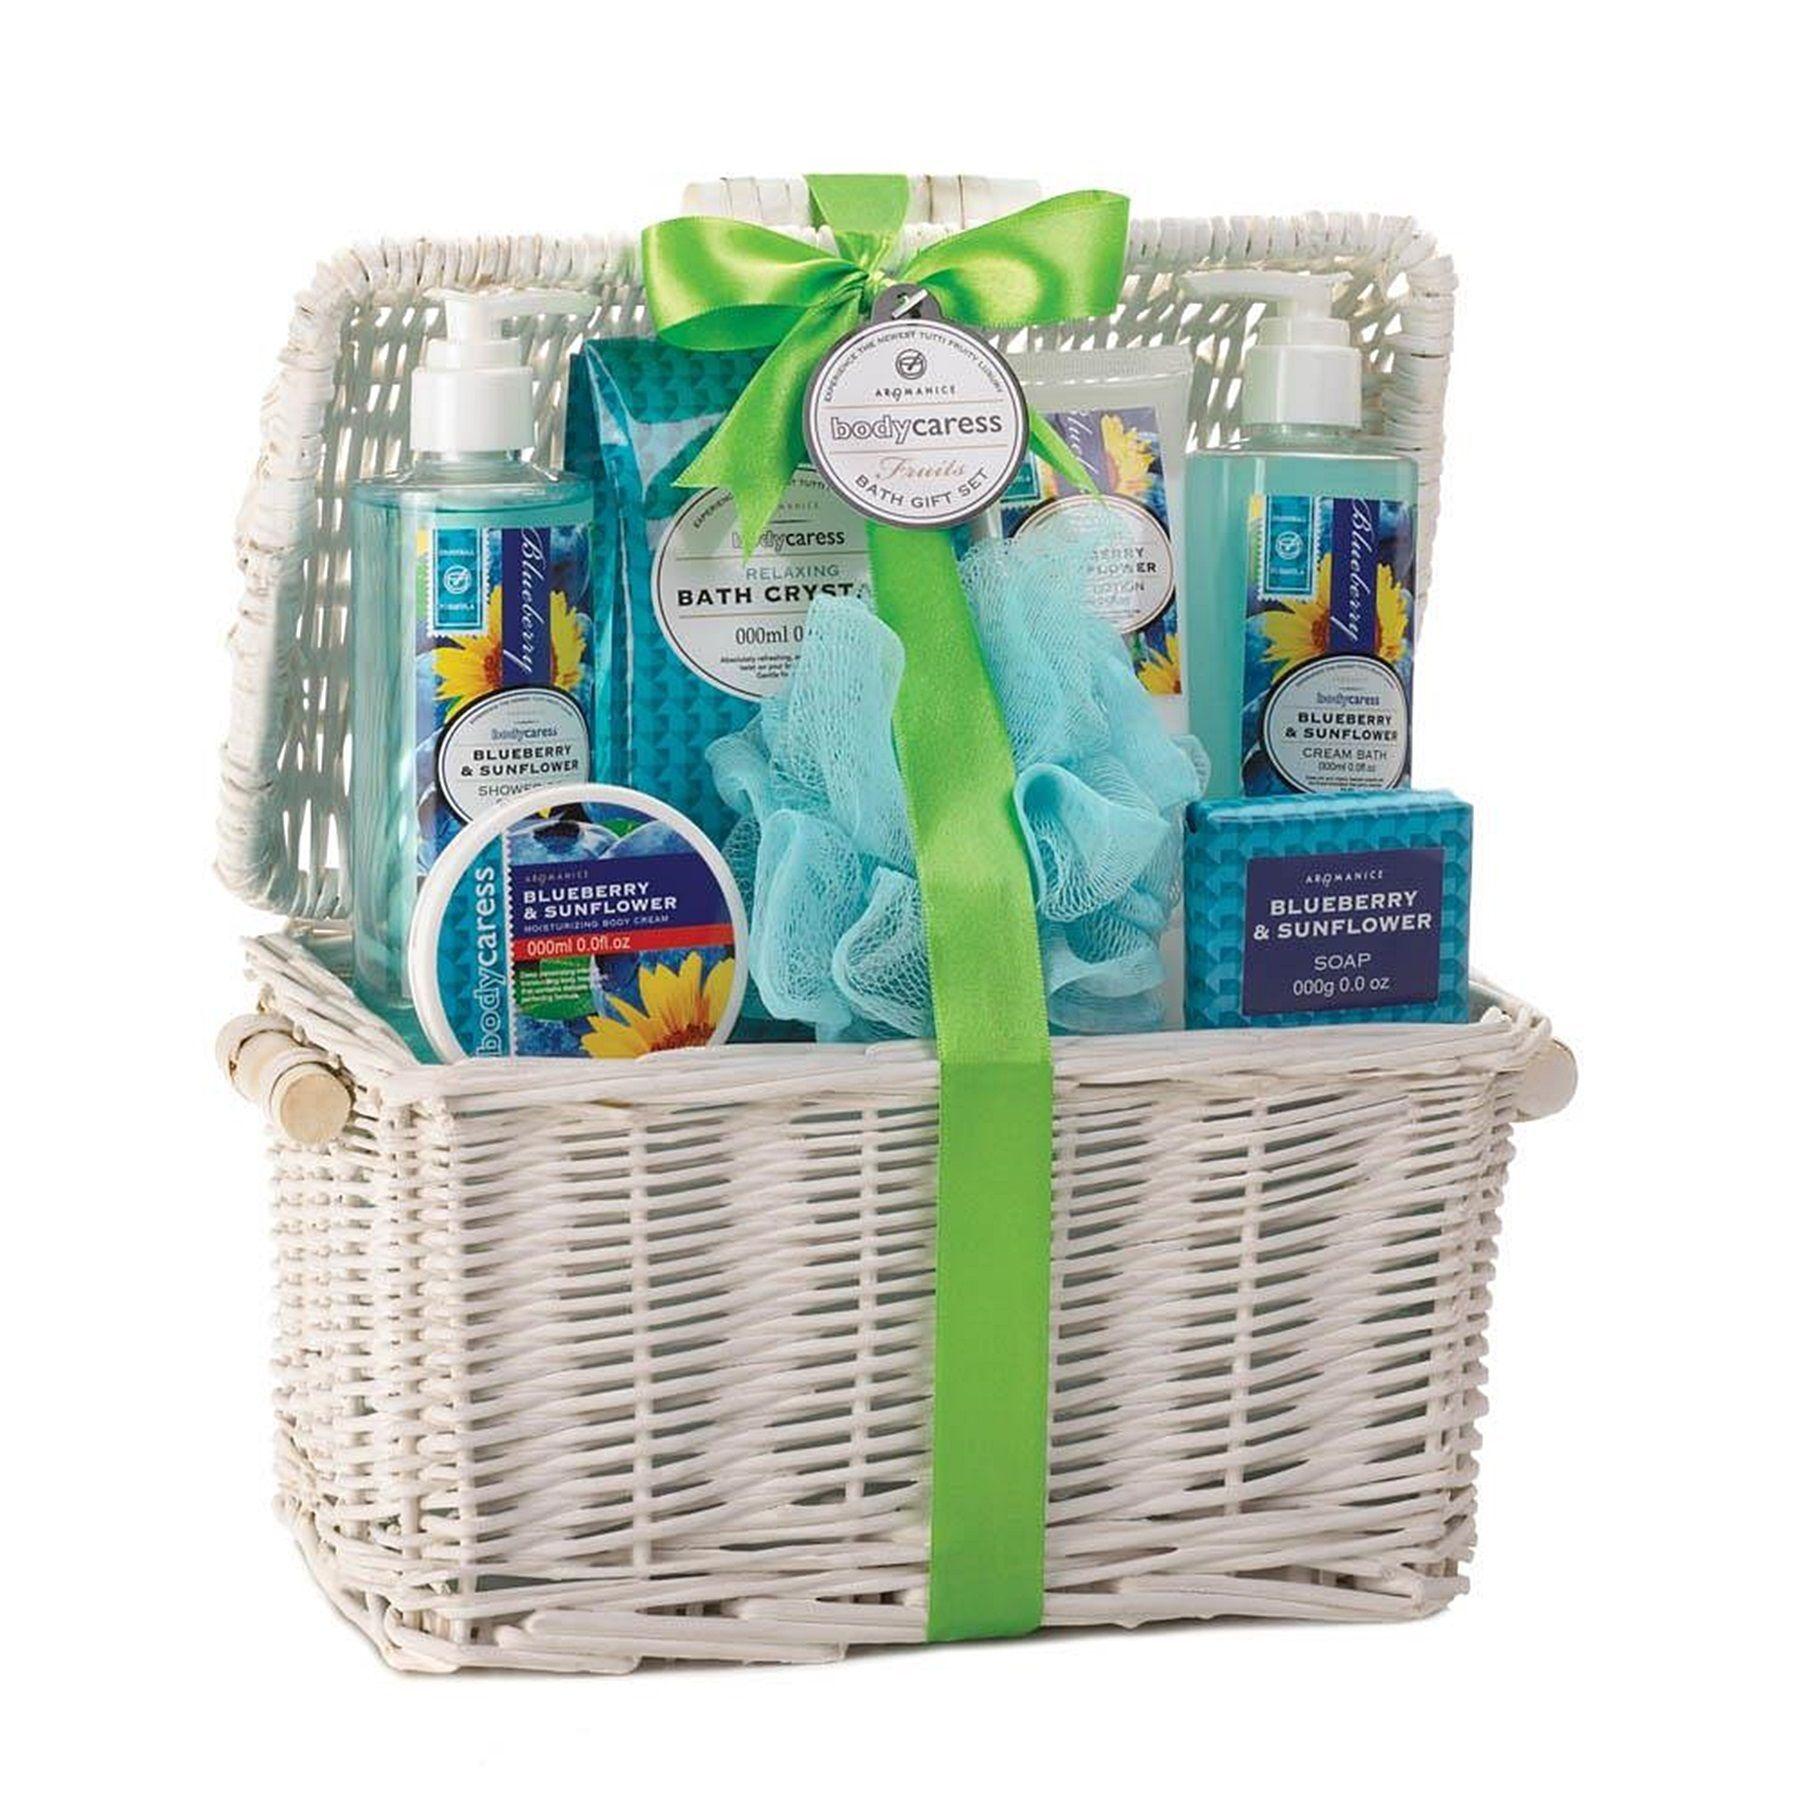 2e0ebf74a6453 Bath and Body Essentials Gift Set